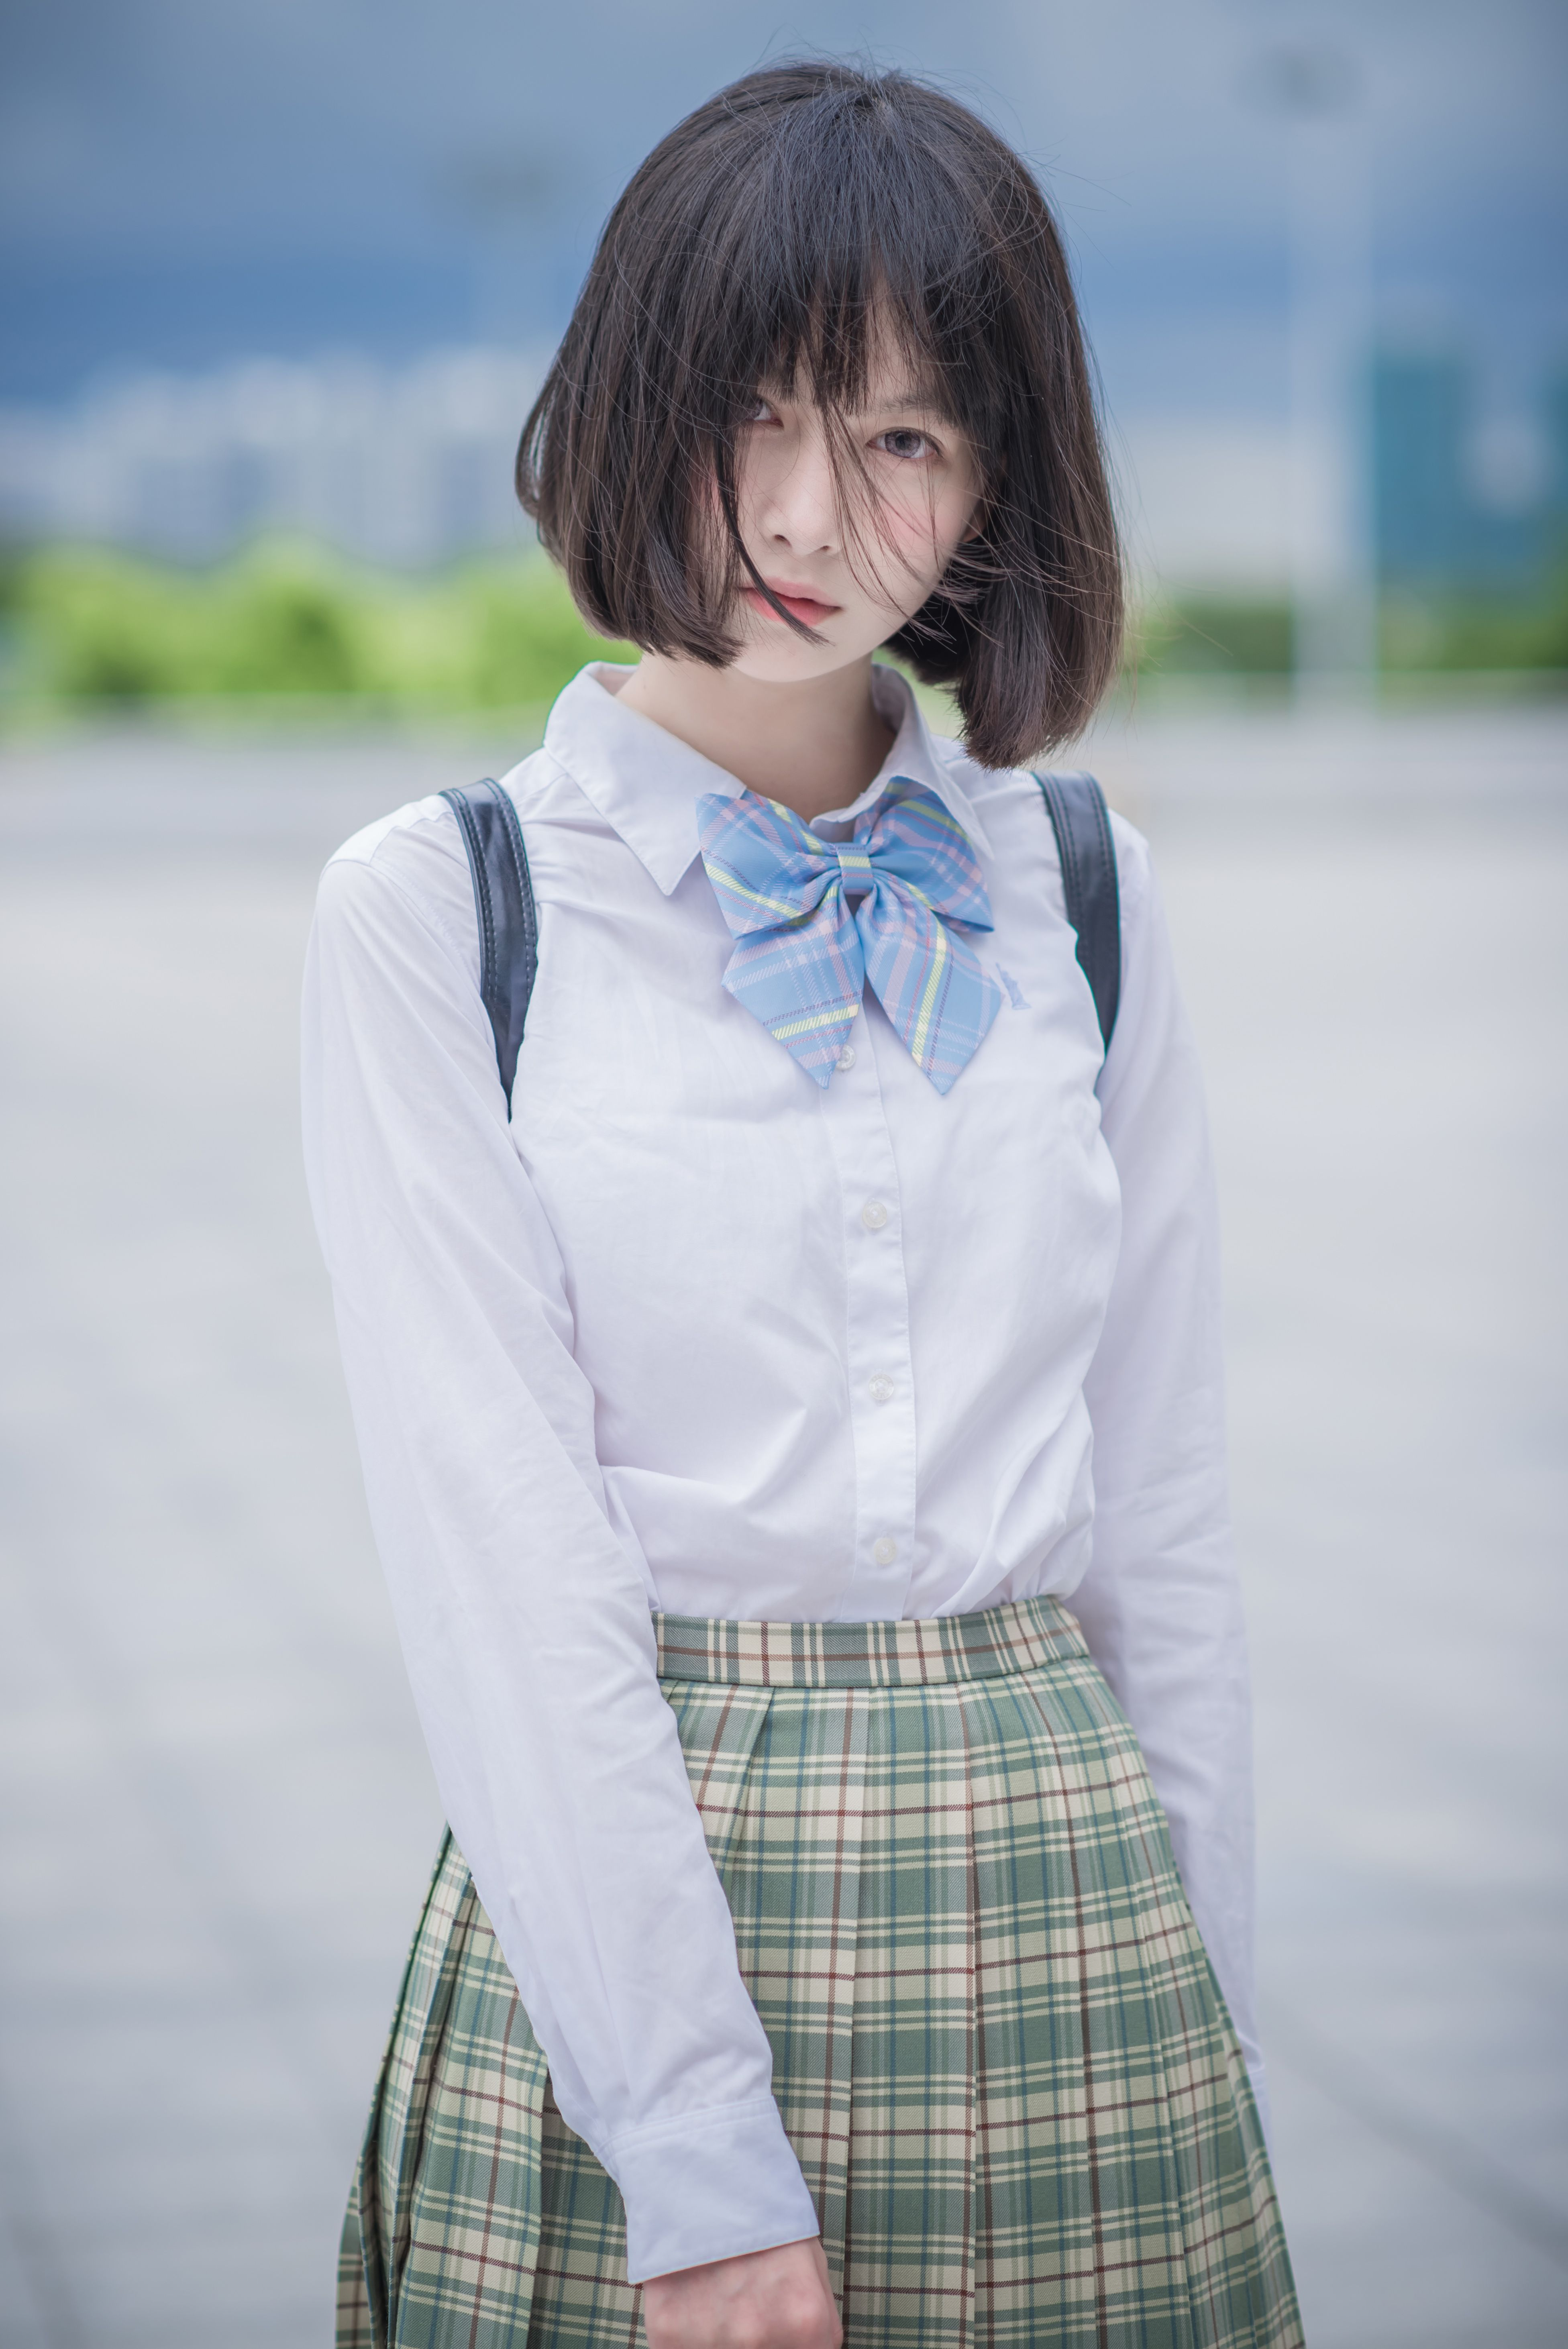 Japanese beauties in school uniforms, jerking dicks in a glory hole